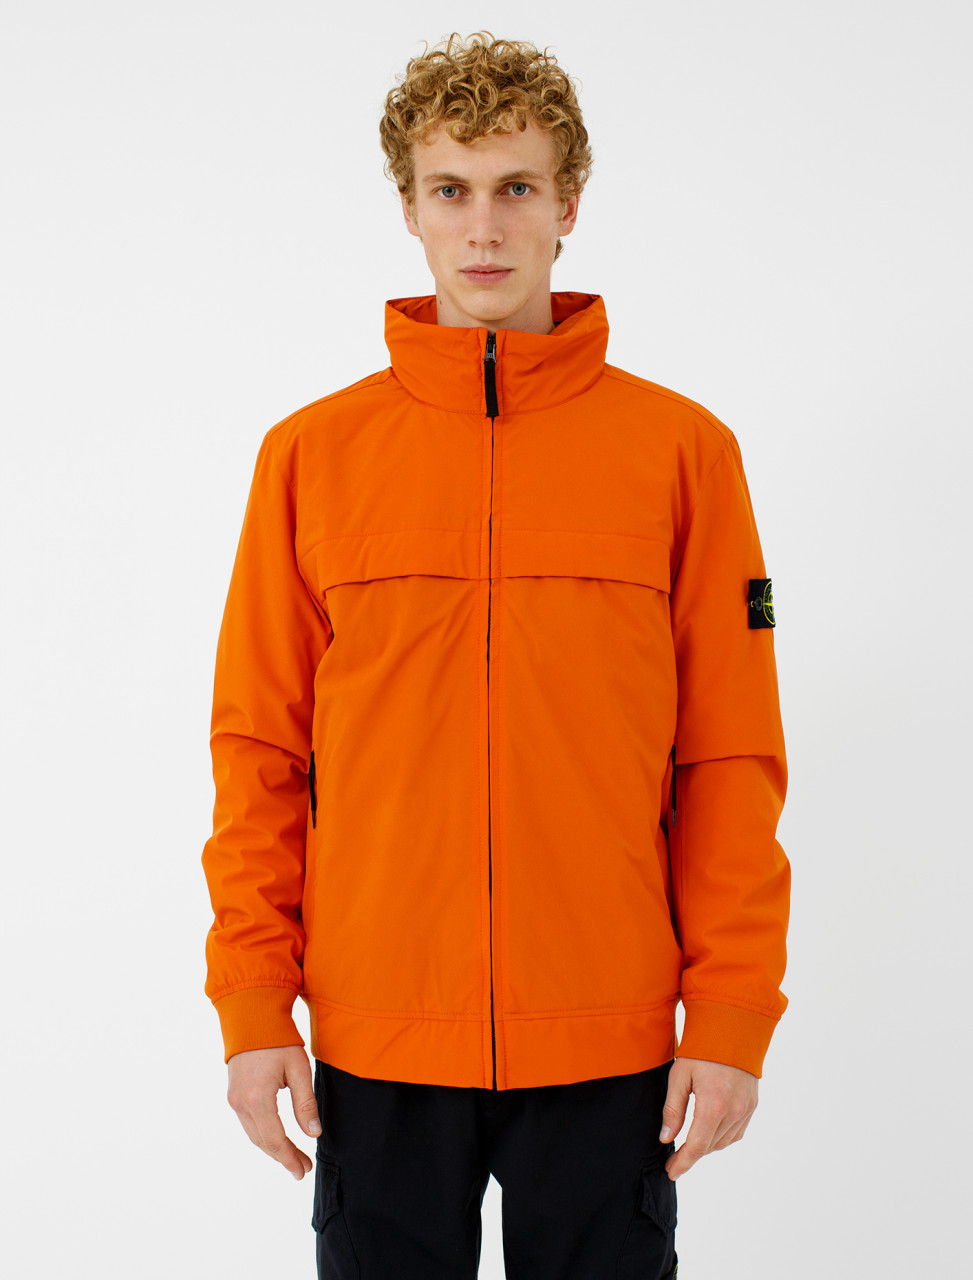 Jacket in Orange